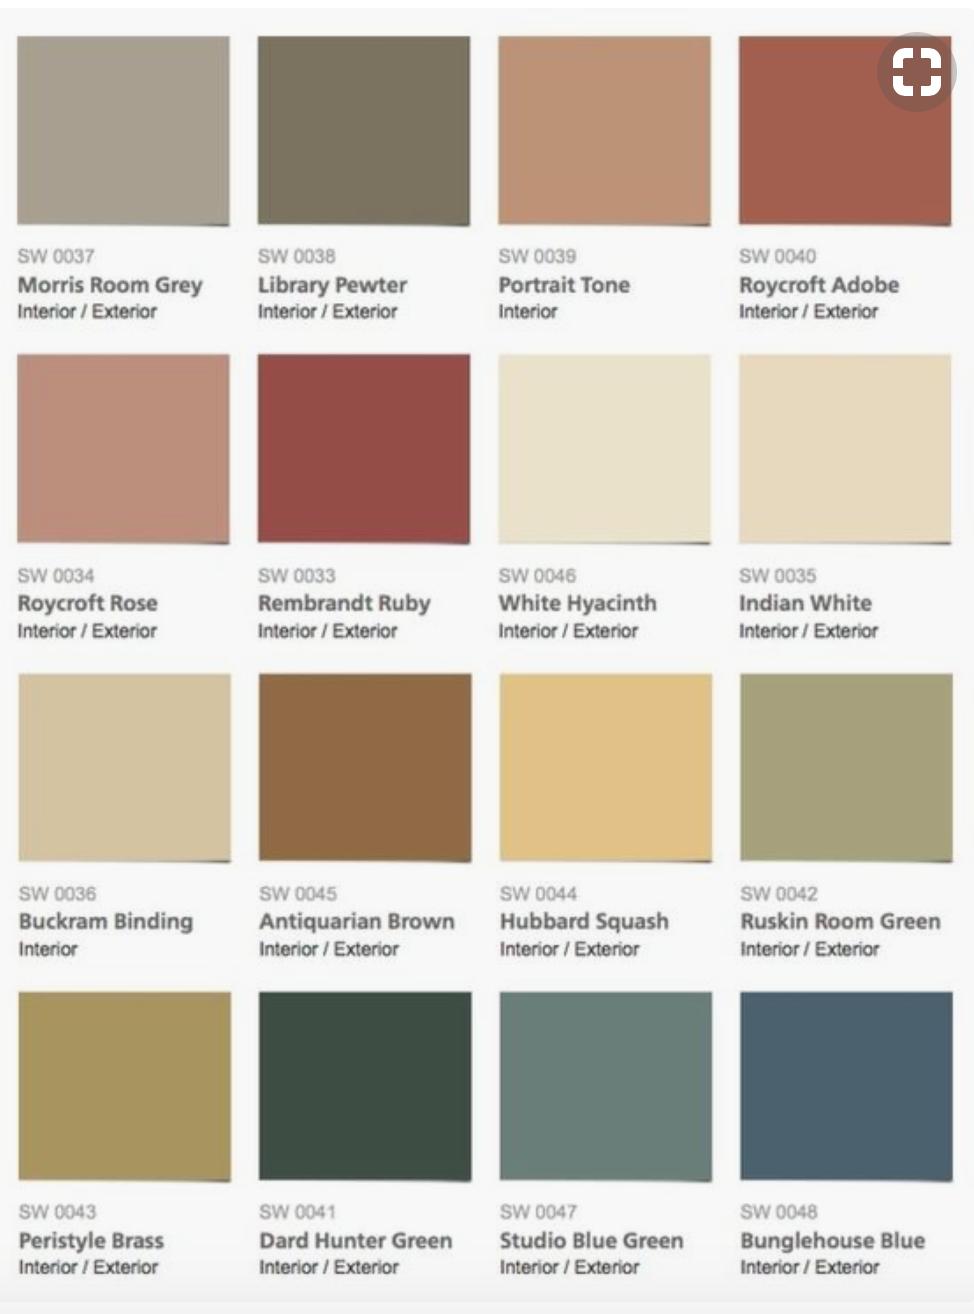 Paint colors | Paint Colors/Stains/Painting Tips | Pinterest | House ...